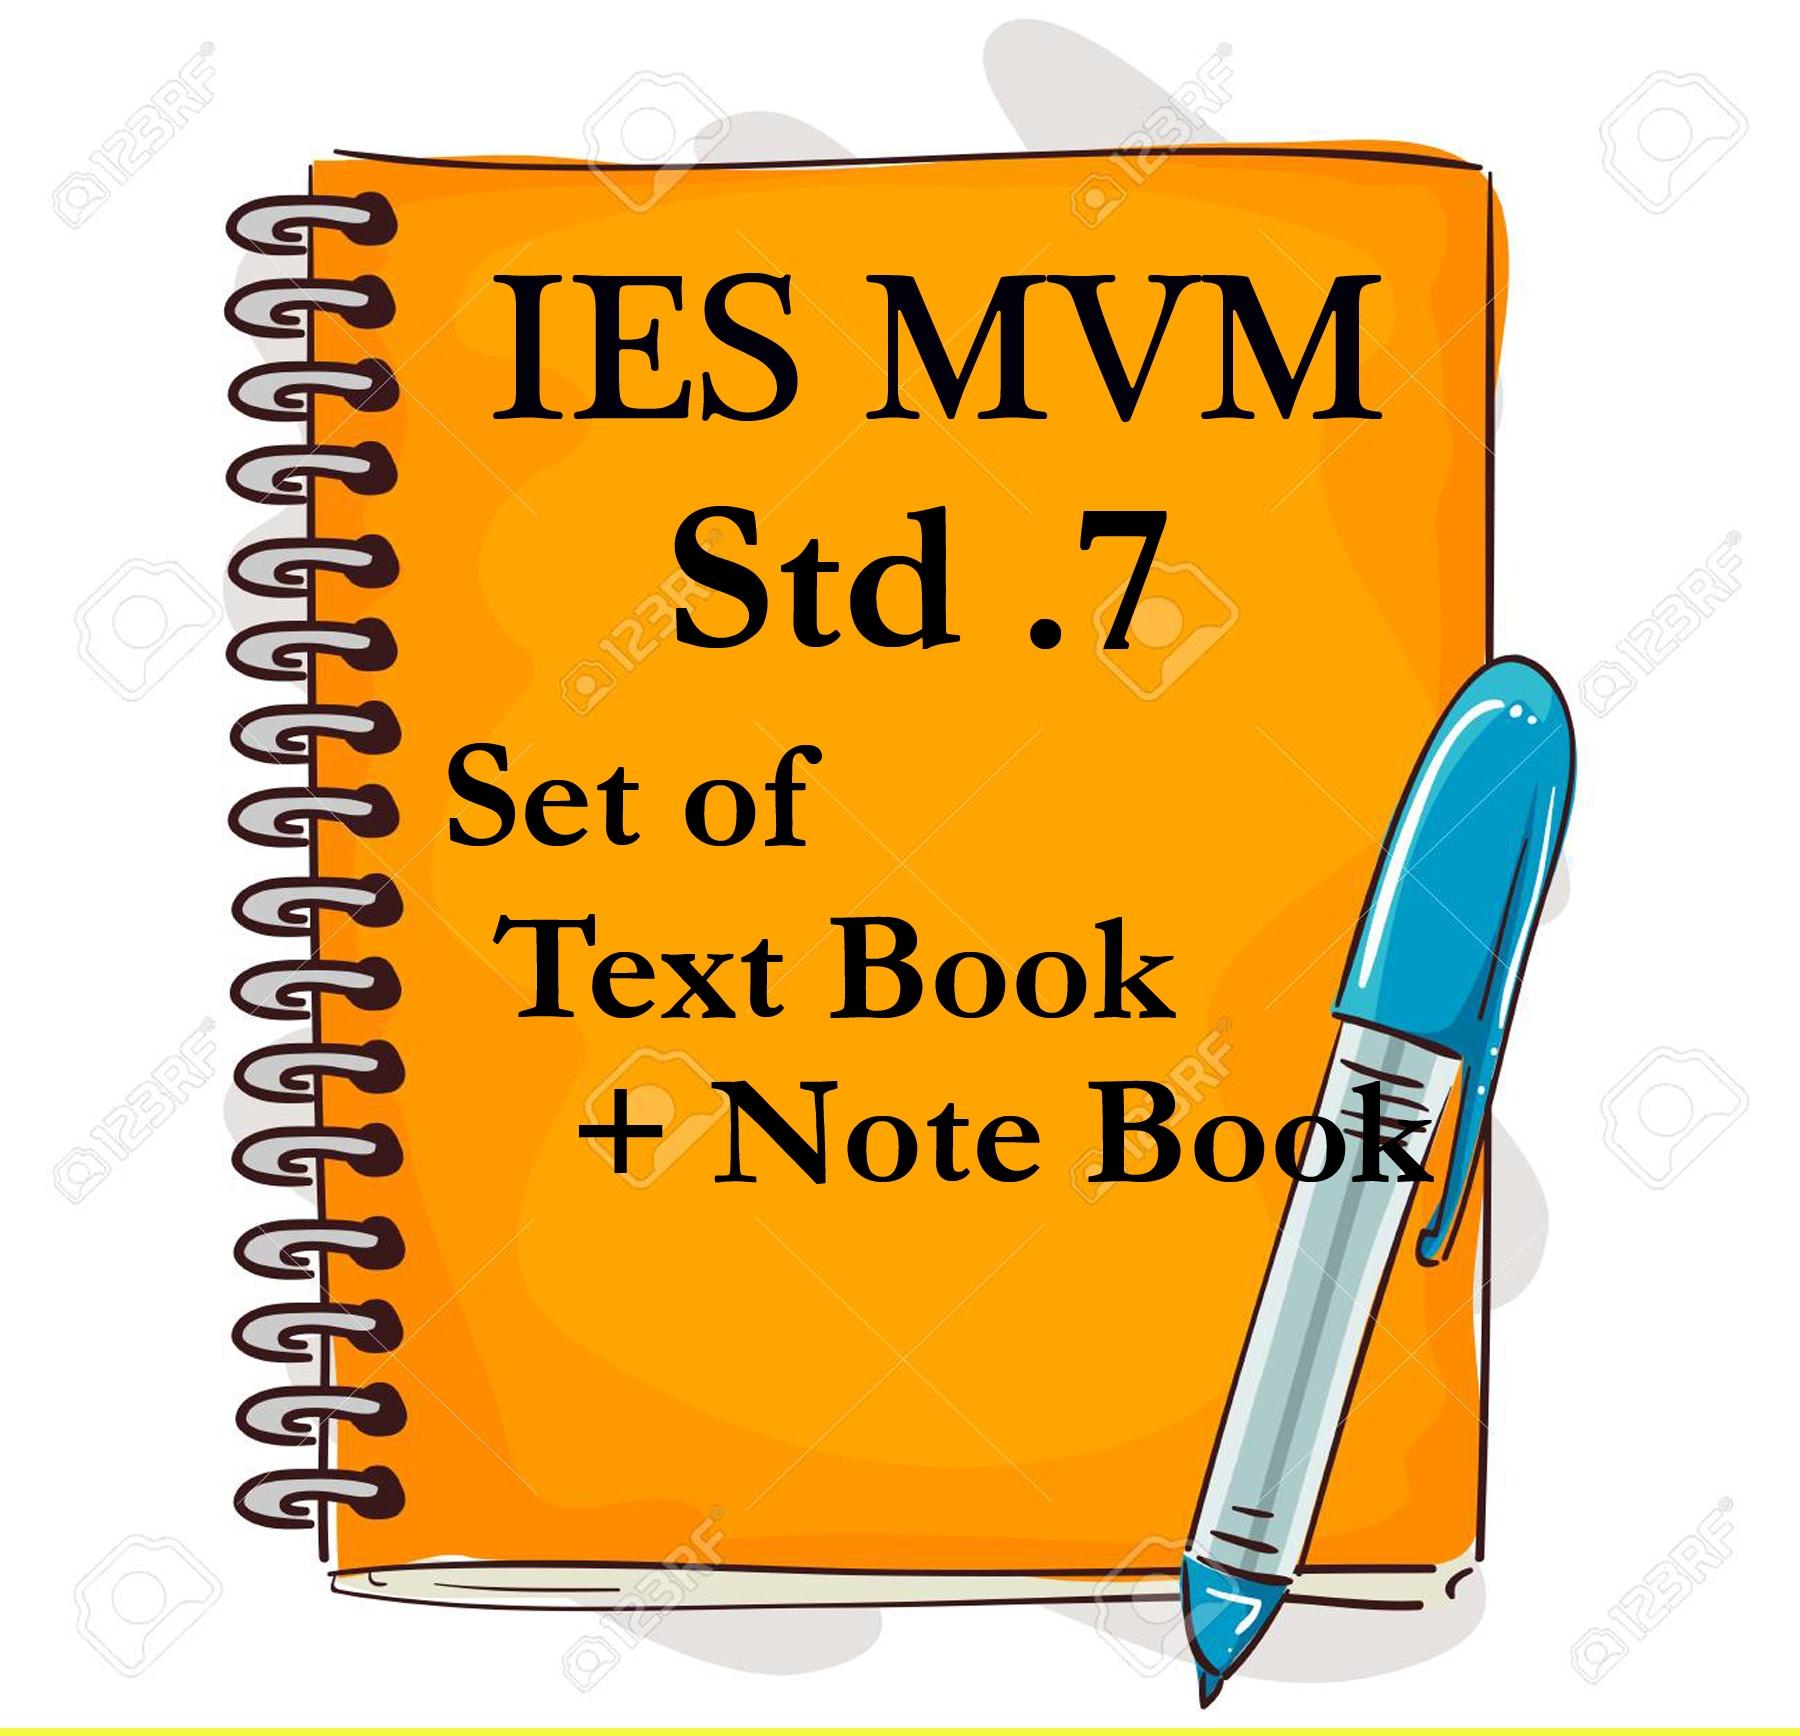 IES MVM STD .7 SET  OF TEXT BOOK + NOTE BOOK